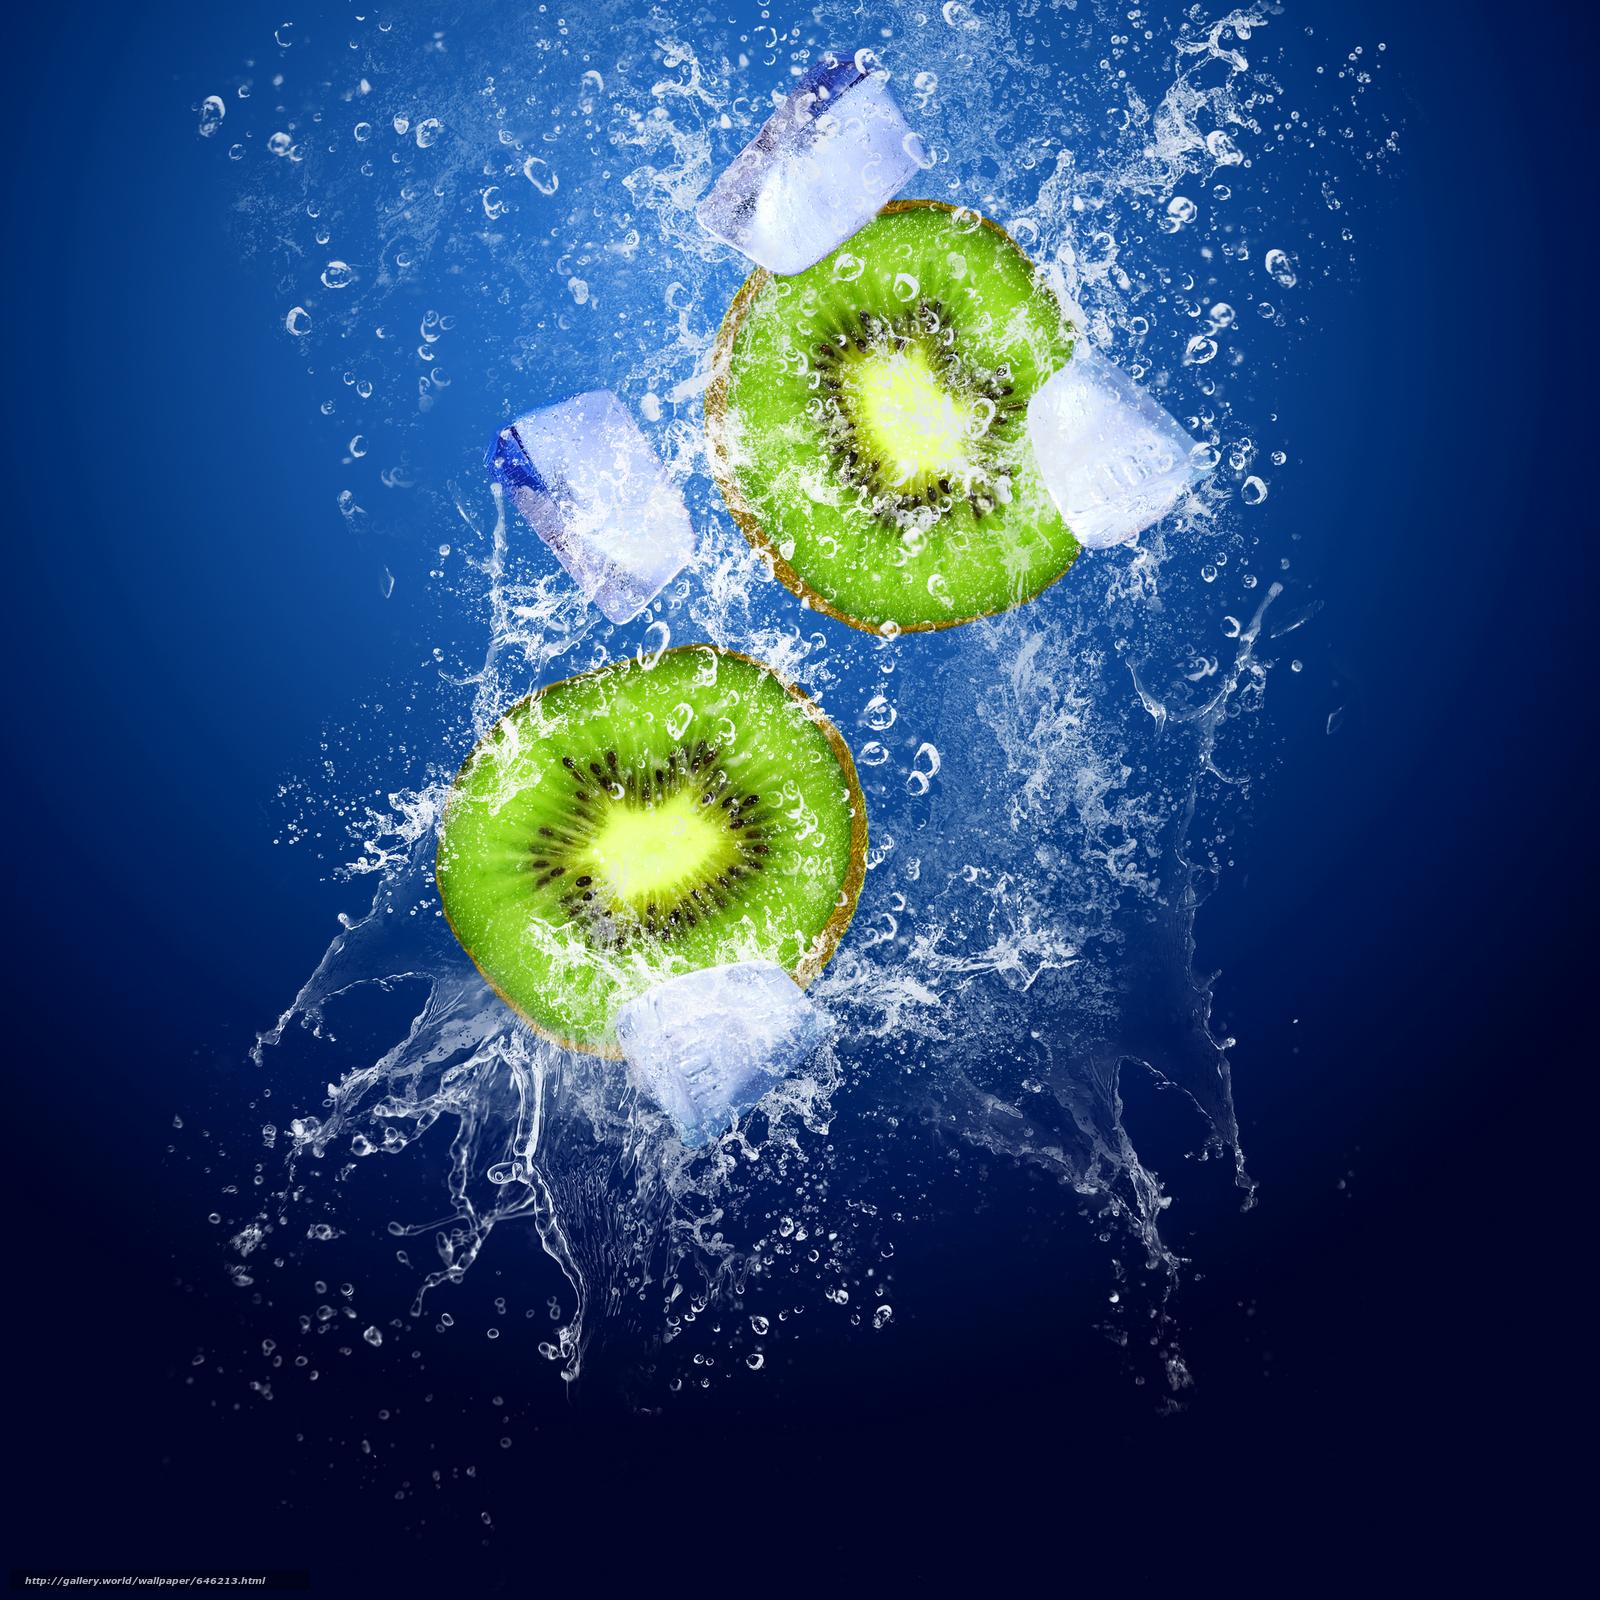 Download wallpaper kiwi,  ice,  spray free desktop wallpaper in the resolution 5500x5500 — picture №646213